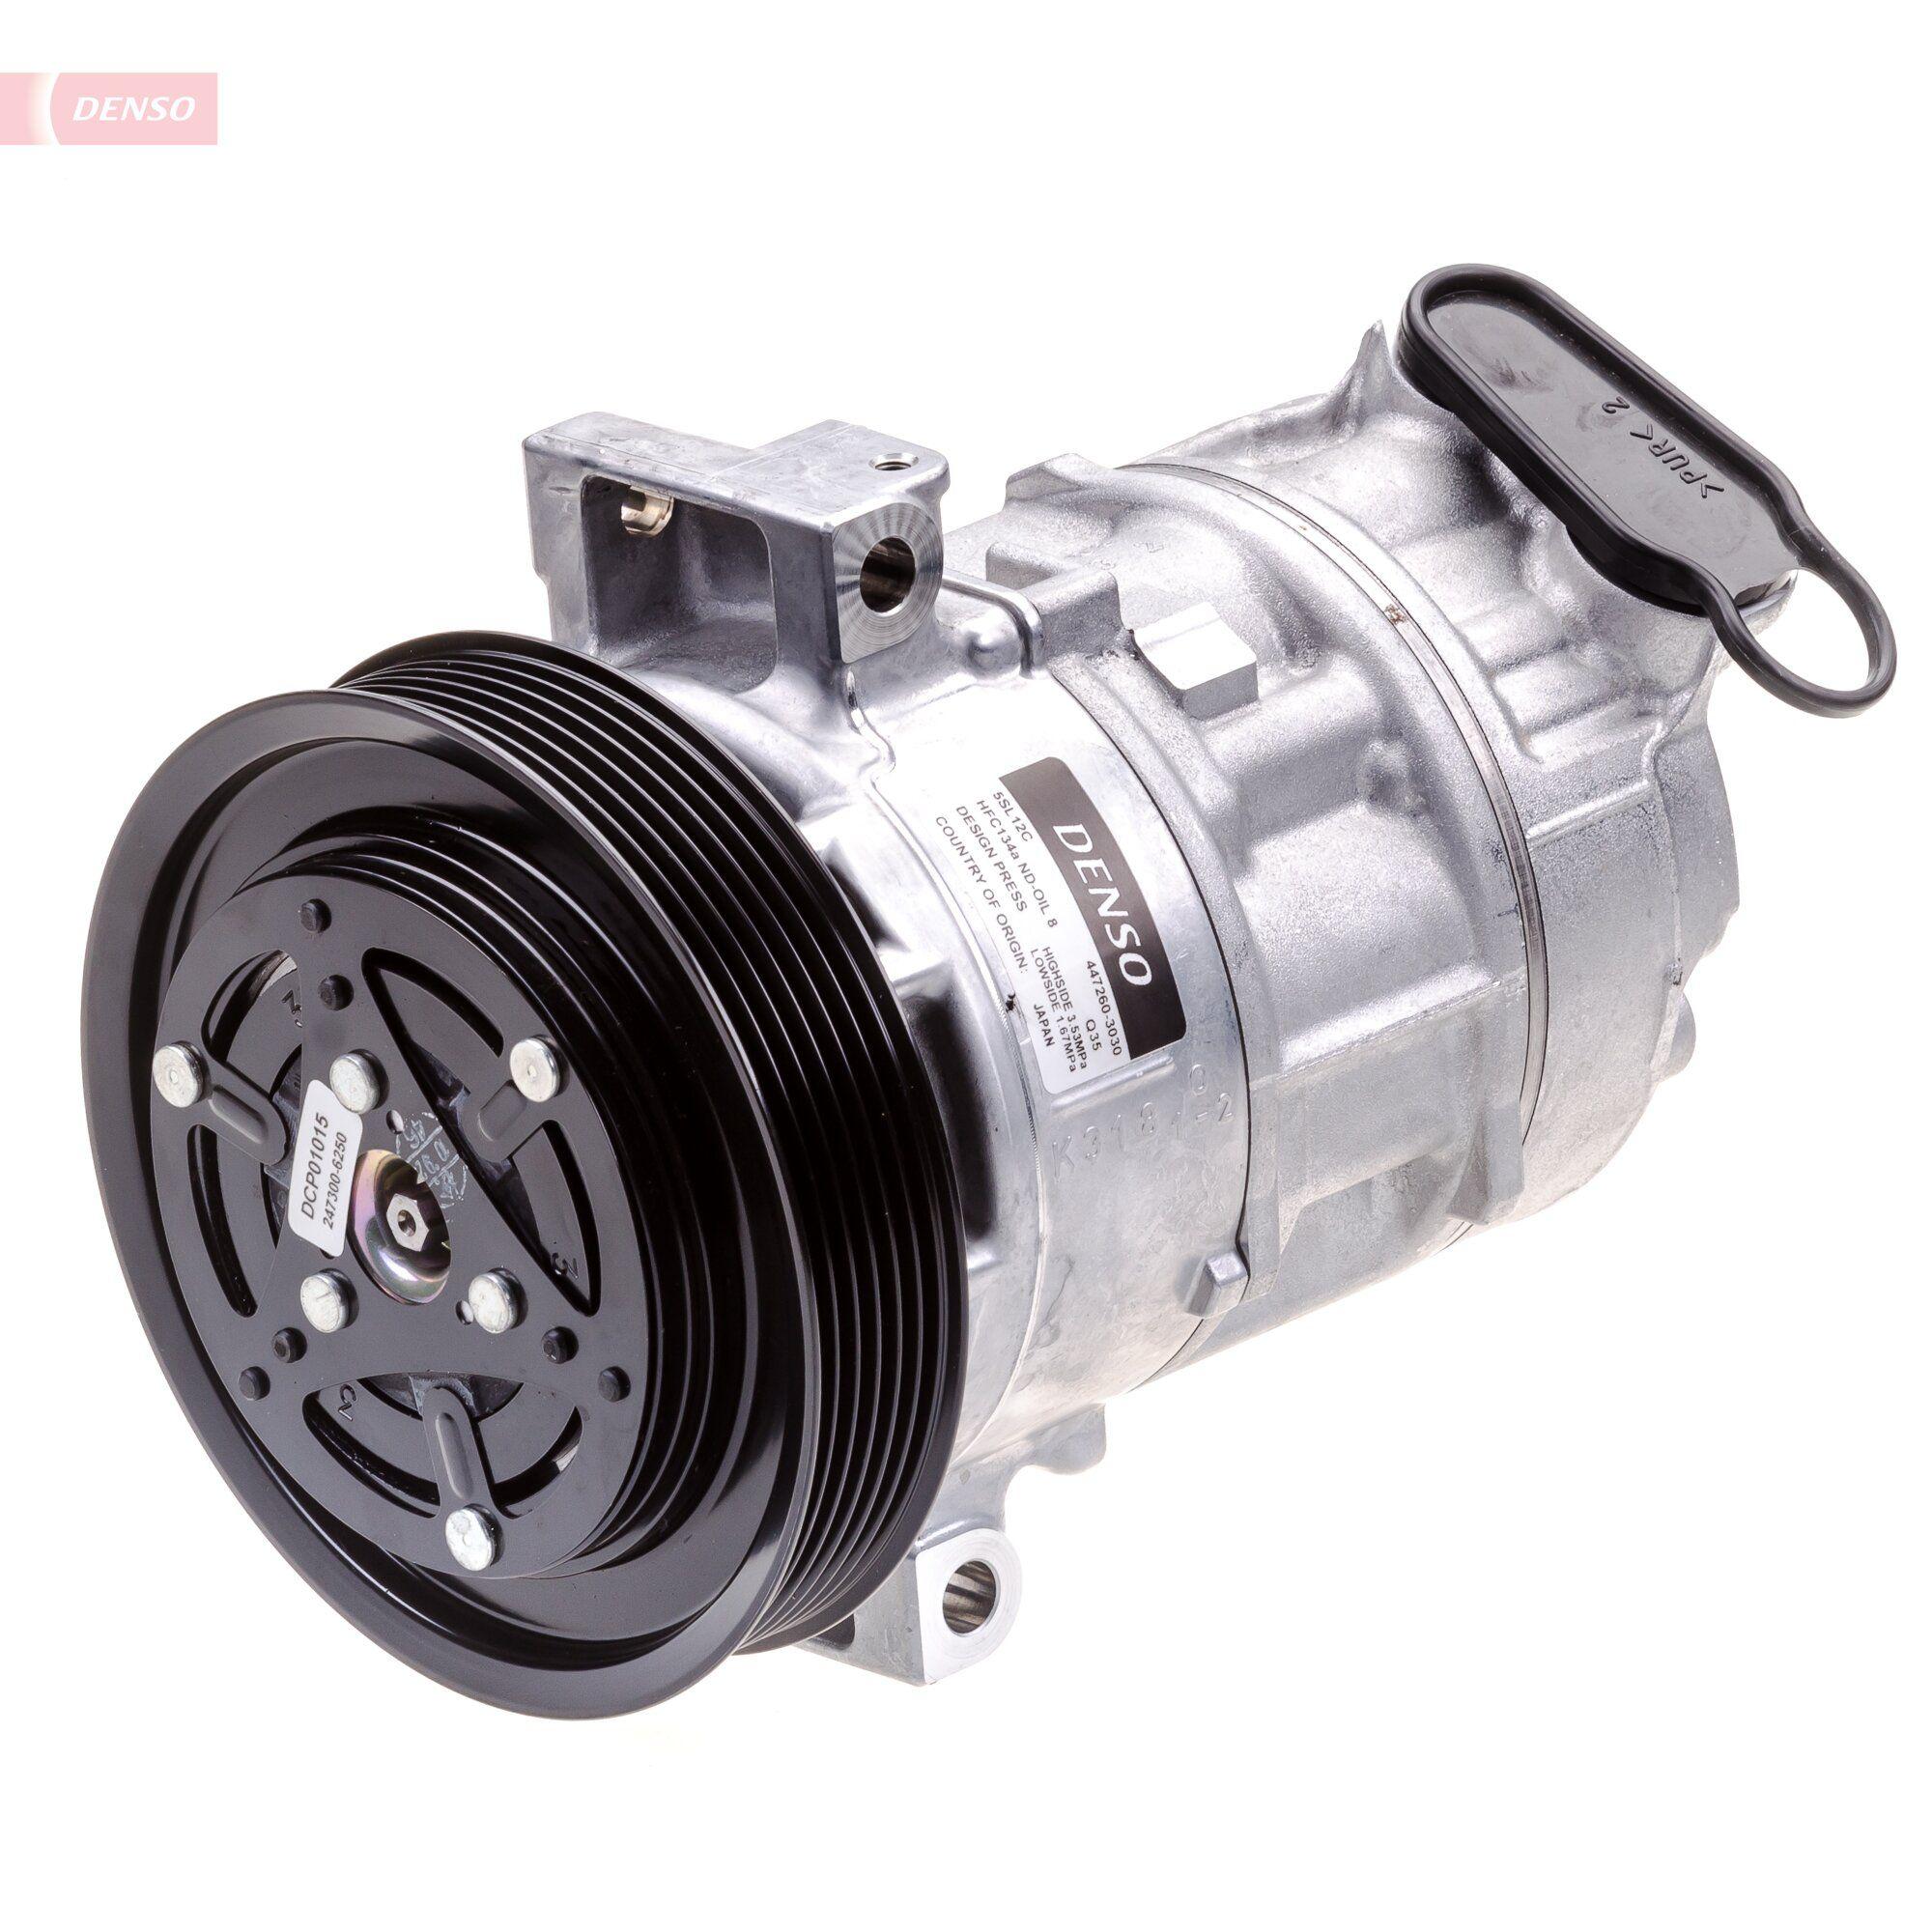 Kompressor Klimaanlage DENSO DCP01015